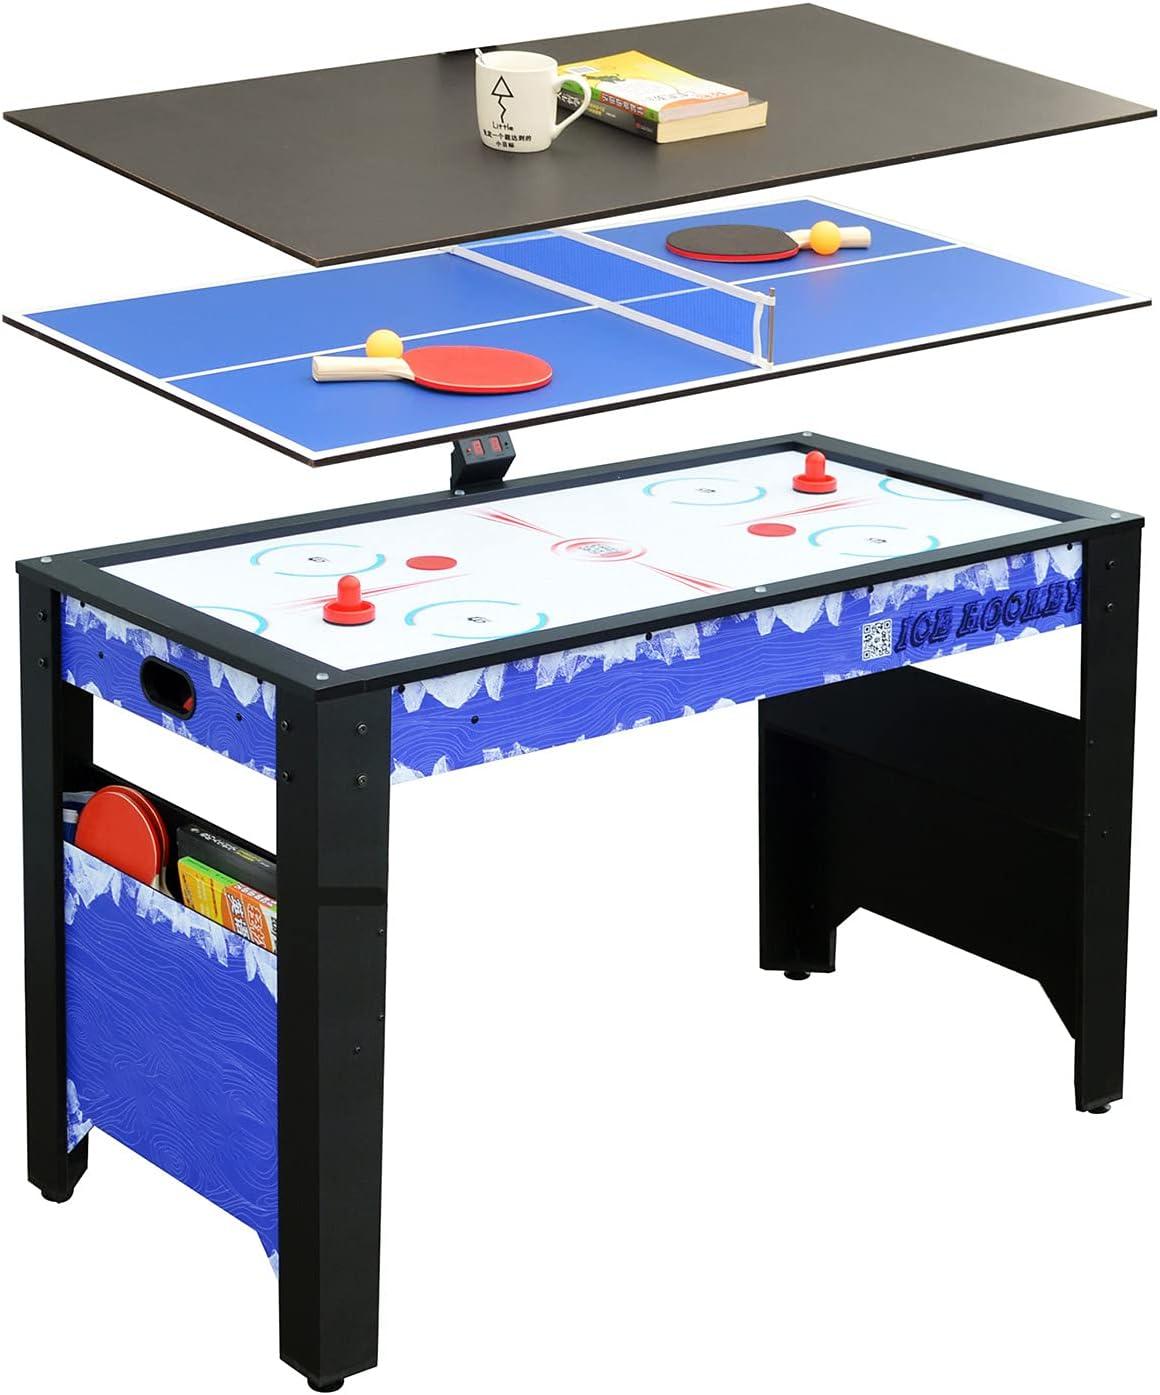 MYRCLMY 3 En 1 Mesa De Juego Combinada, Mesa De Hockey De Aire con Puntuación Electrónica, Escritorio Compacto, Mini Ping-Pong Mesa, para Niños Mesas De Billar para Adultos